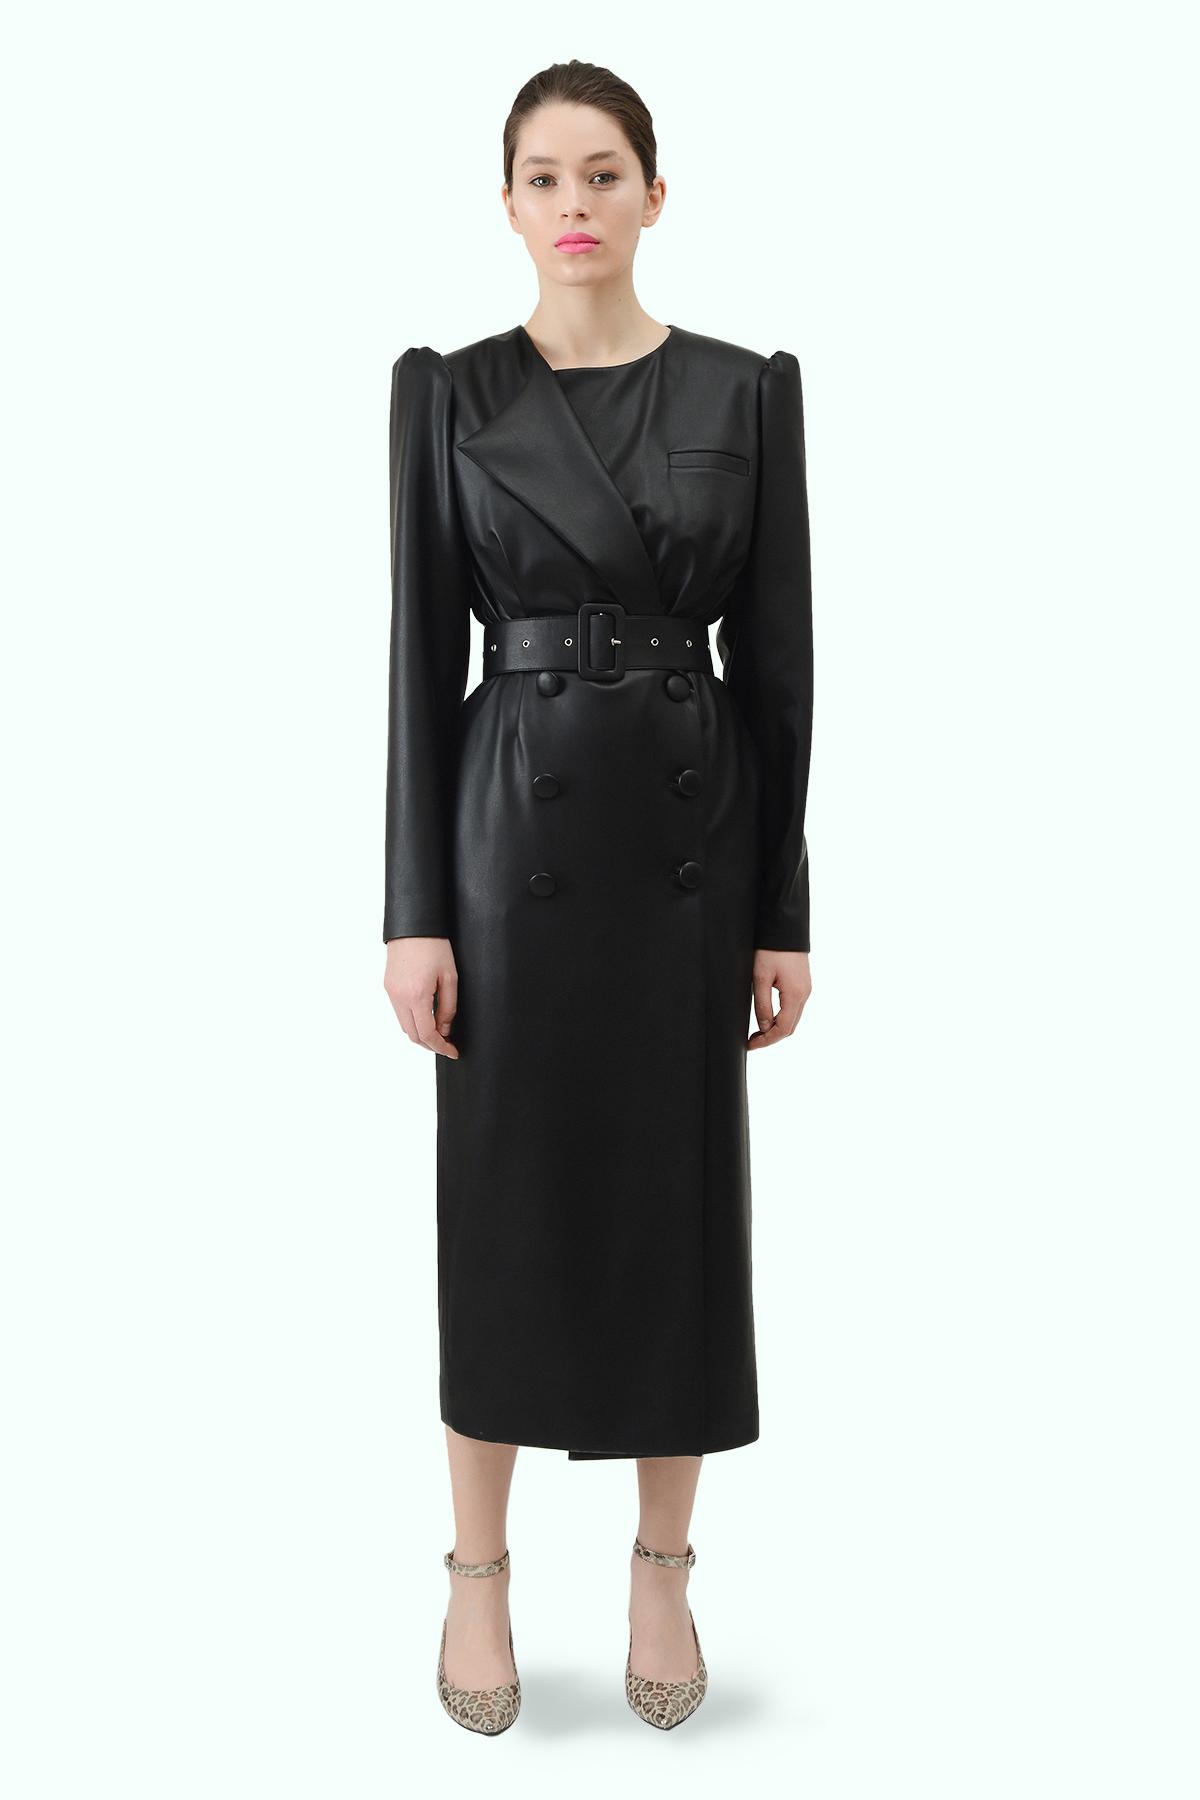 Black vegan leather double breast blazer dress